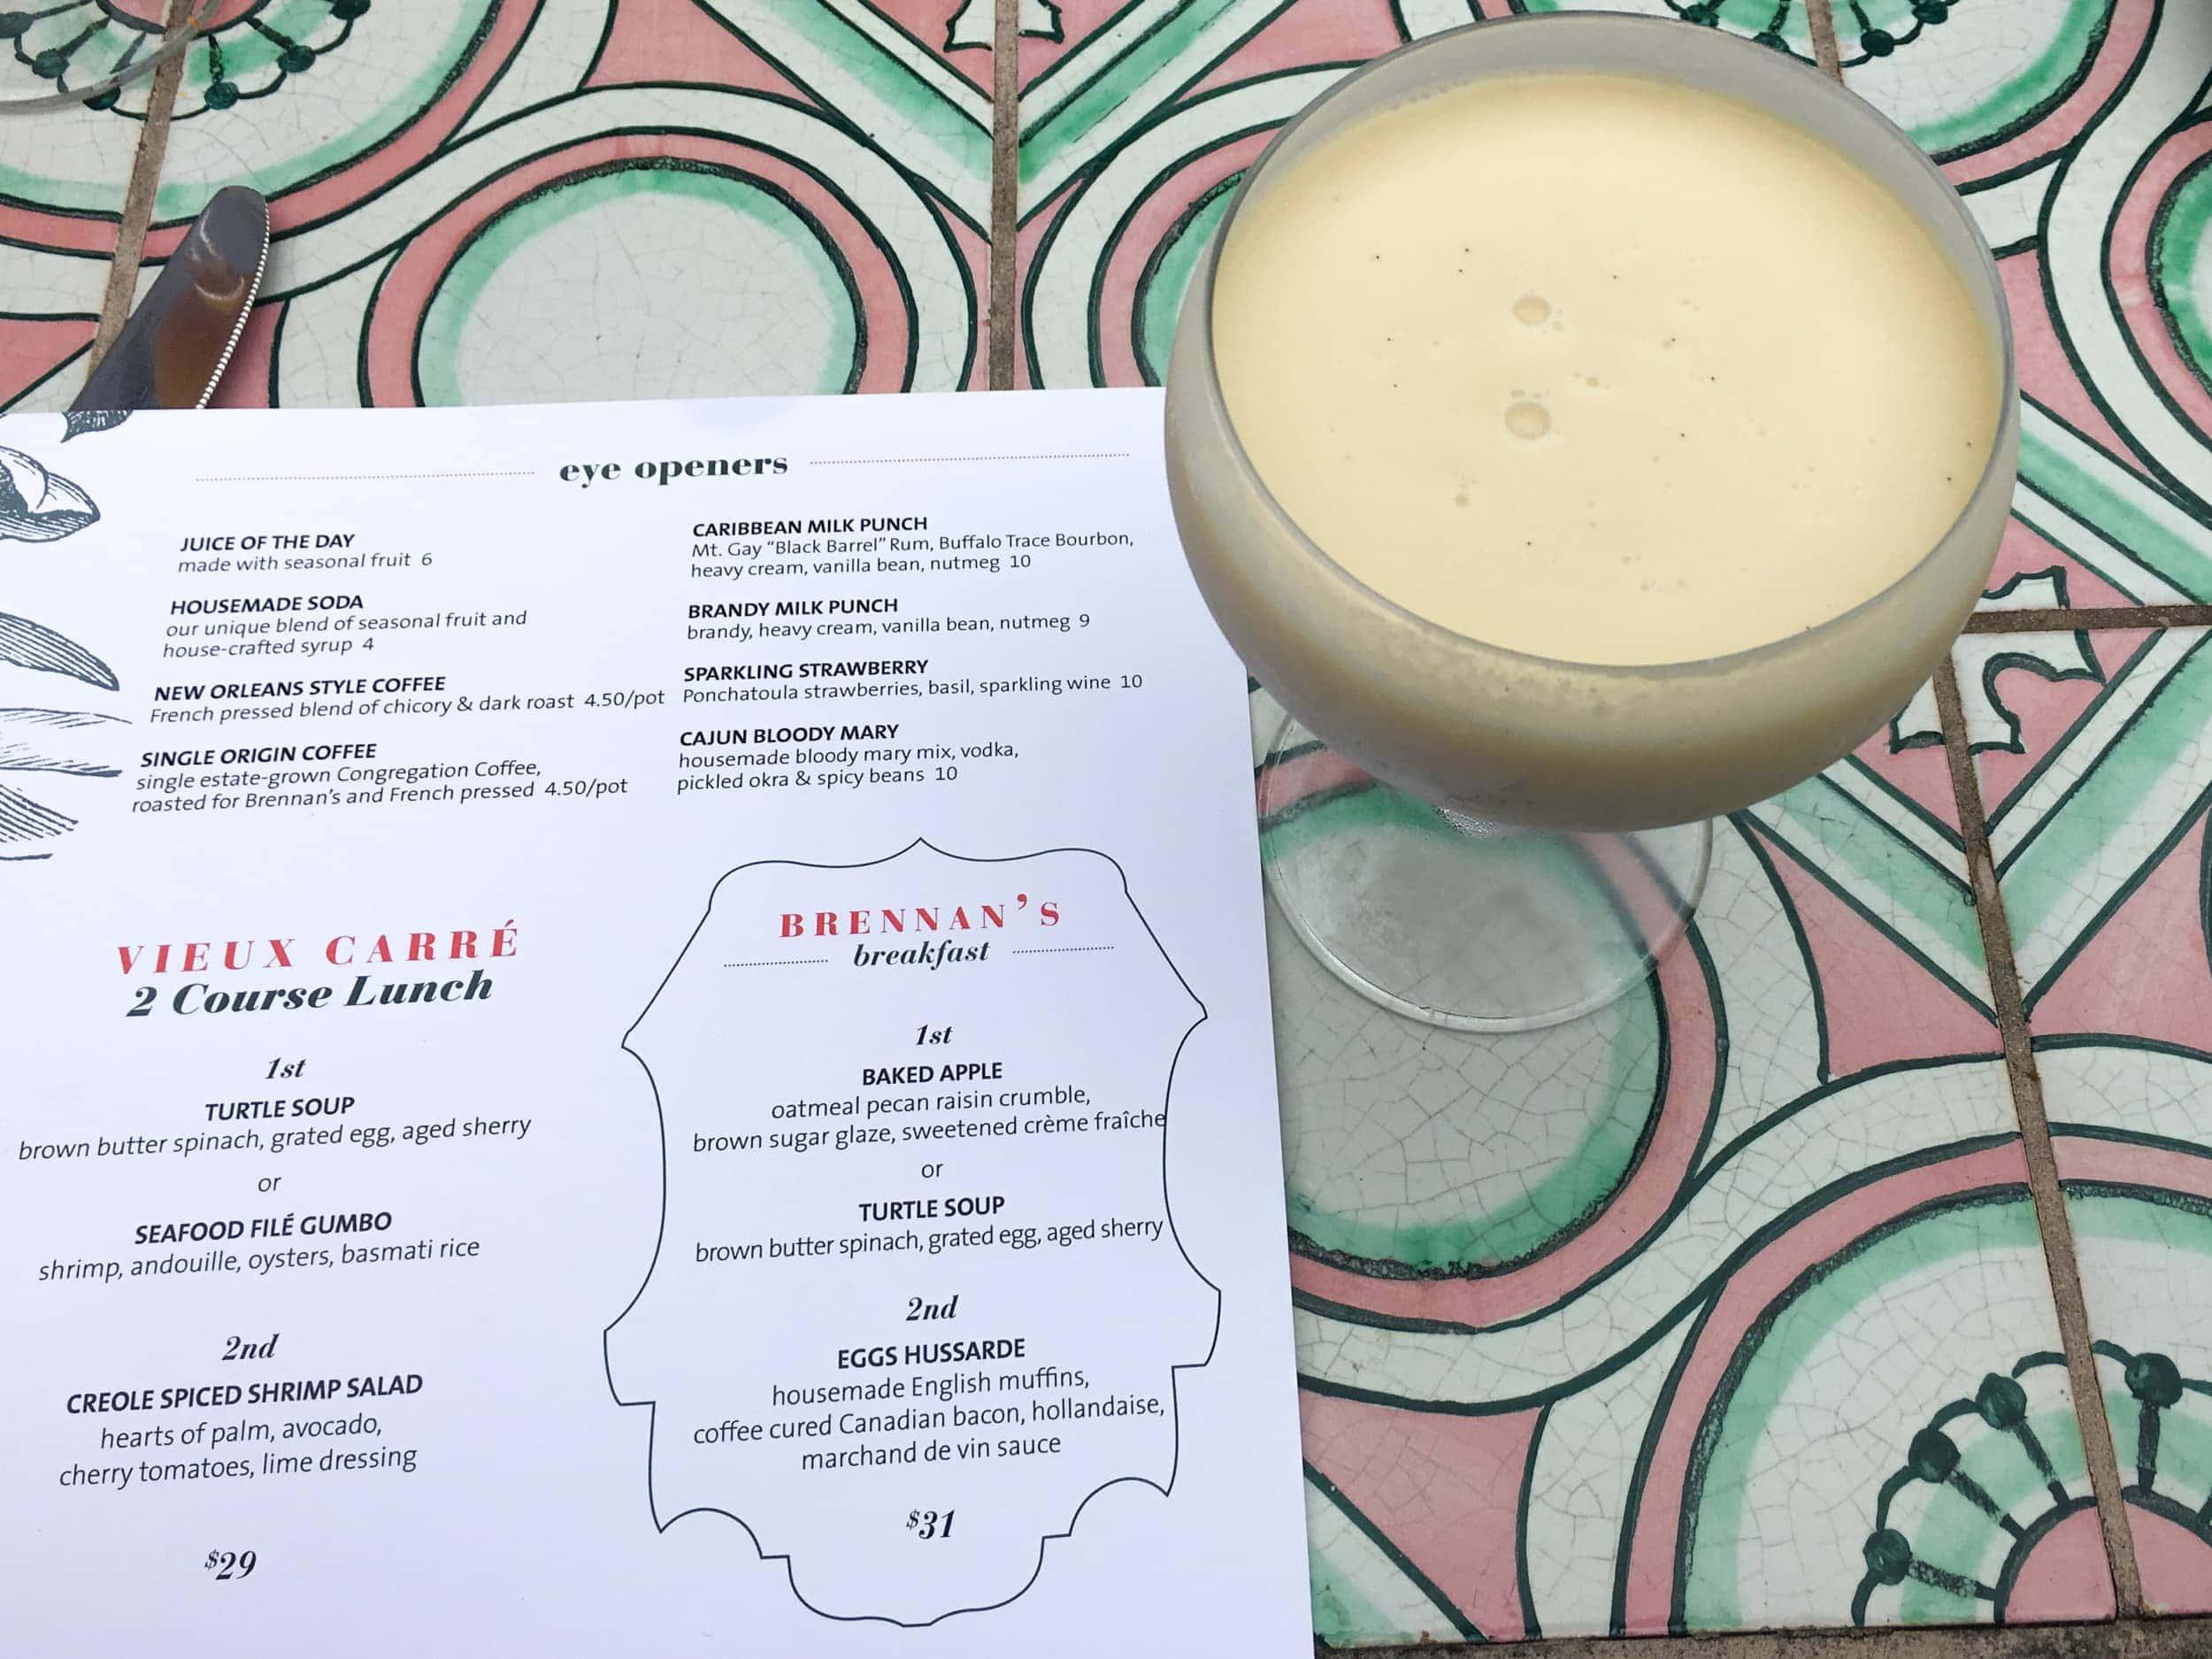 Caribbean milk punch and the breakfast menu at Brennan's